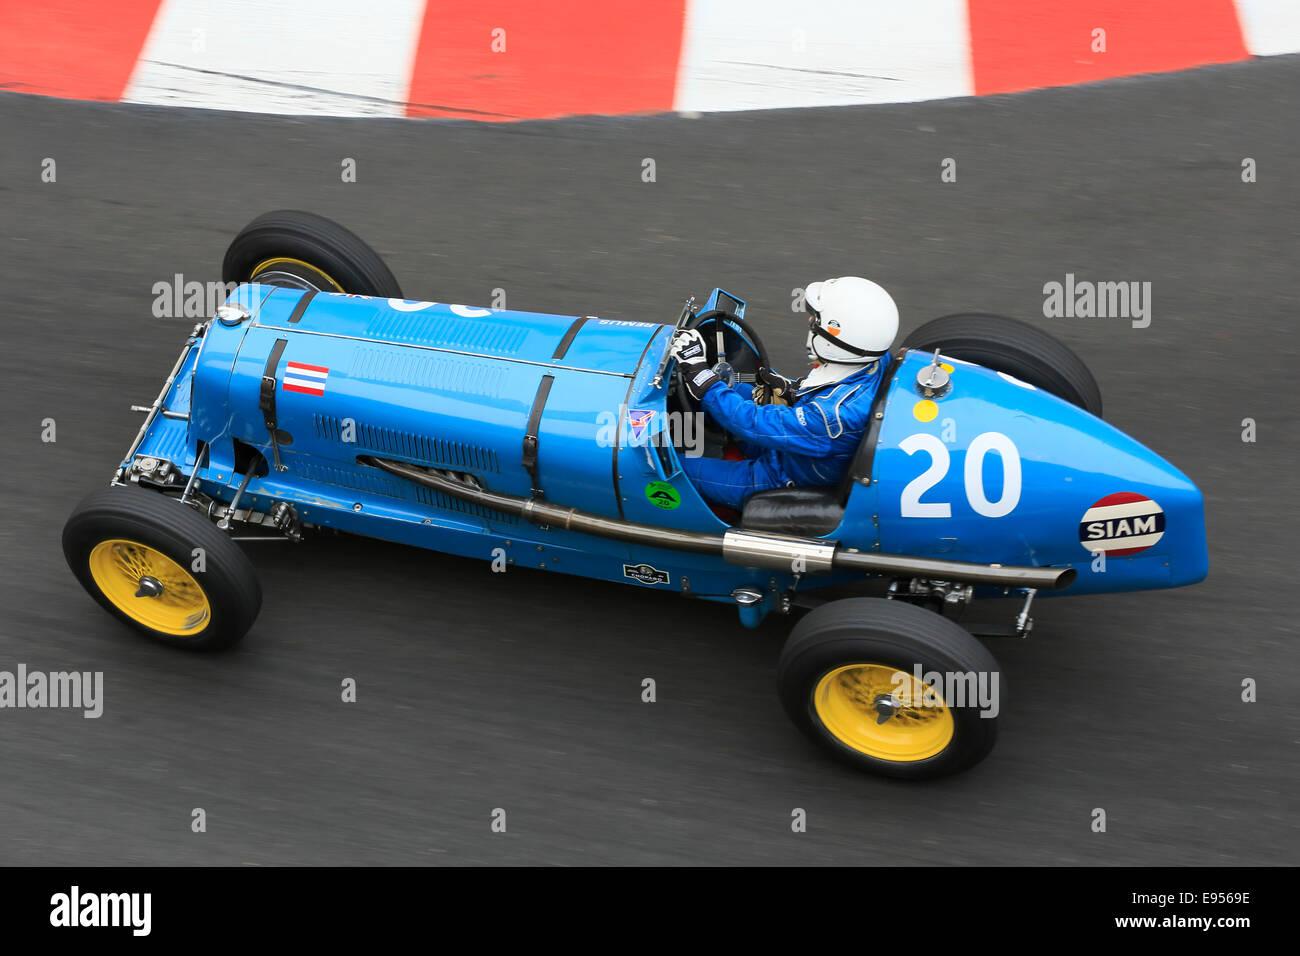 Historic racing car Era R5B, built in 1936, driver Charles McCabe, 9th Grand Prix de Monaco Historique, Principality - Stock Image